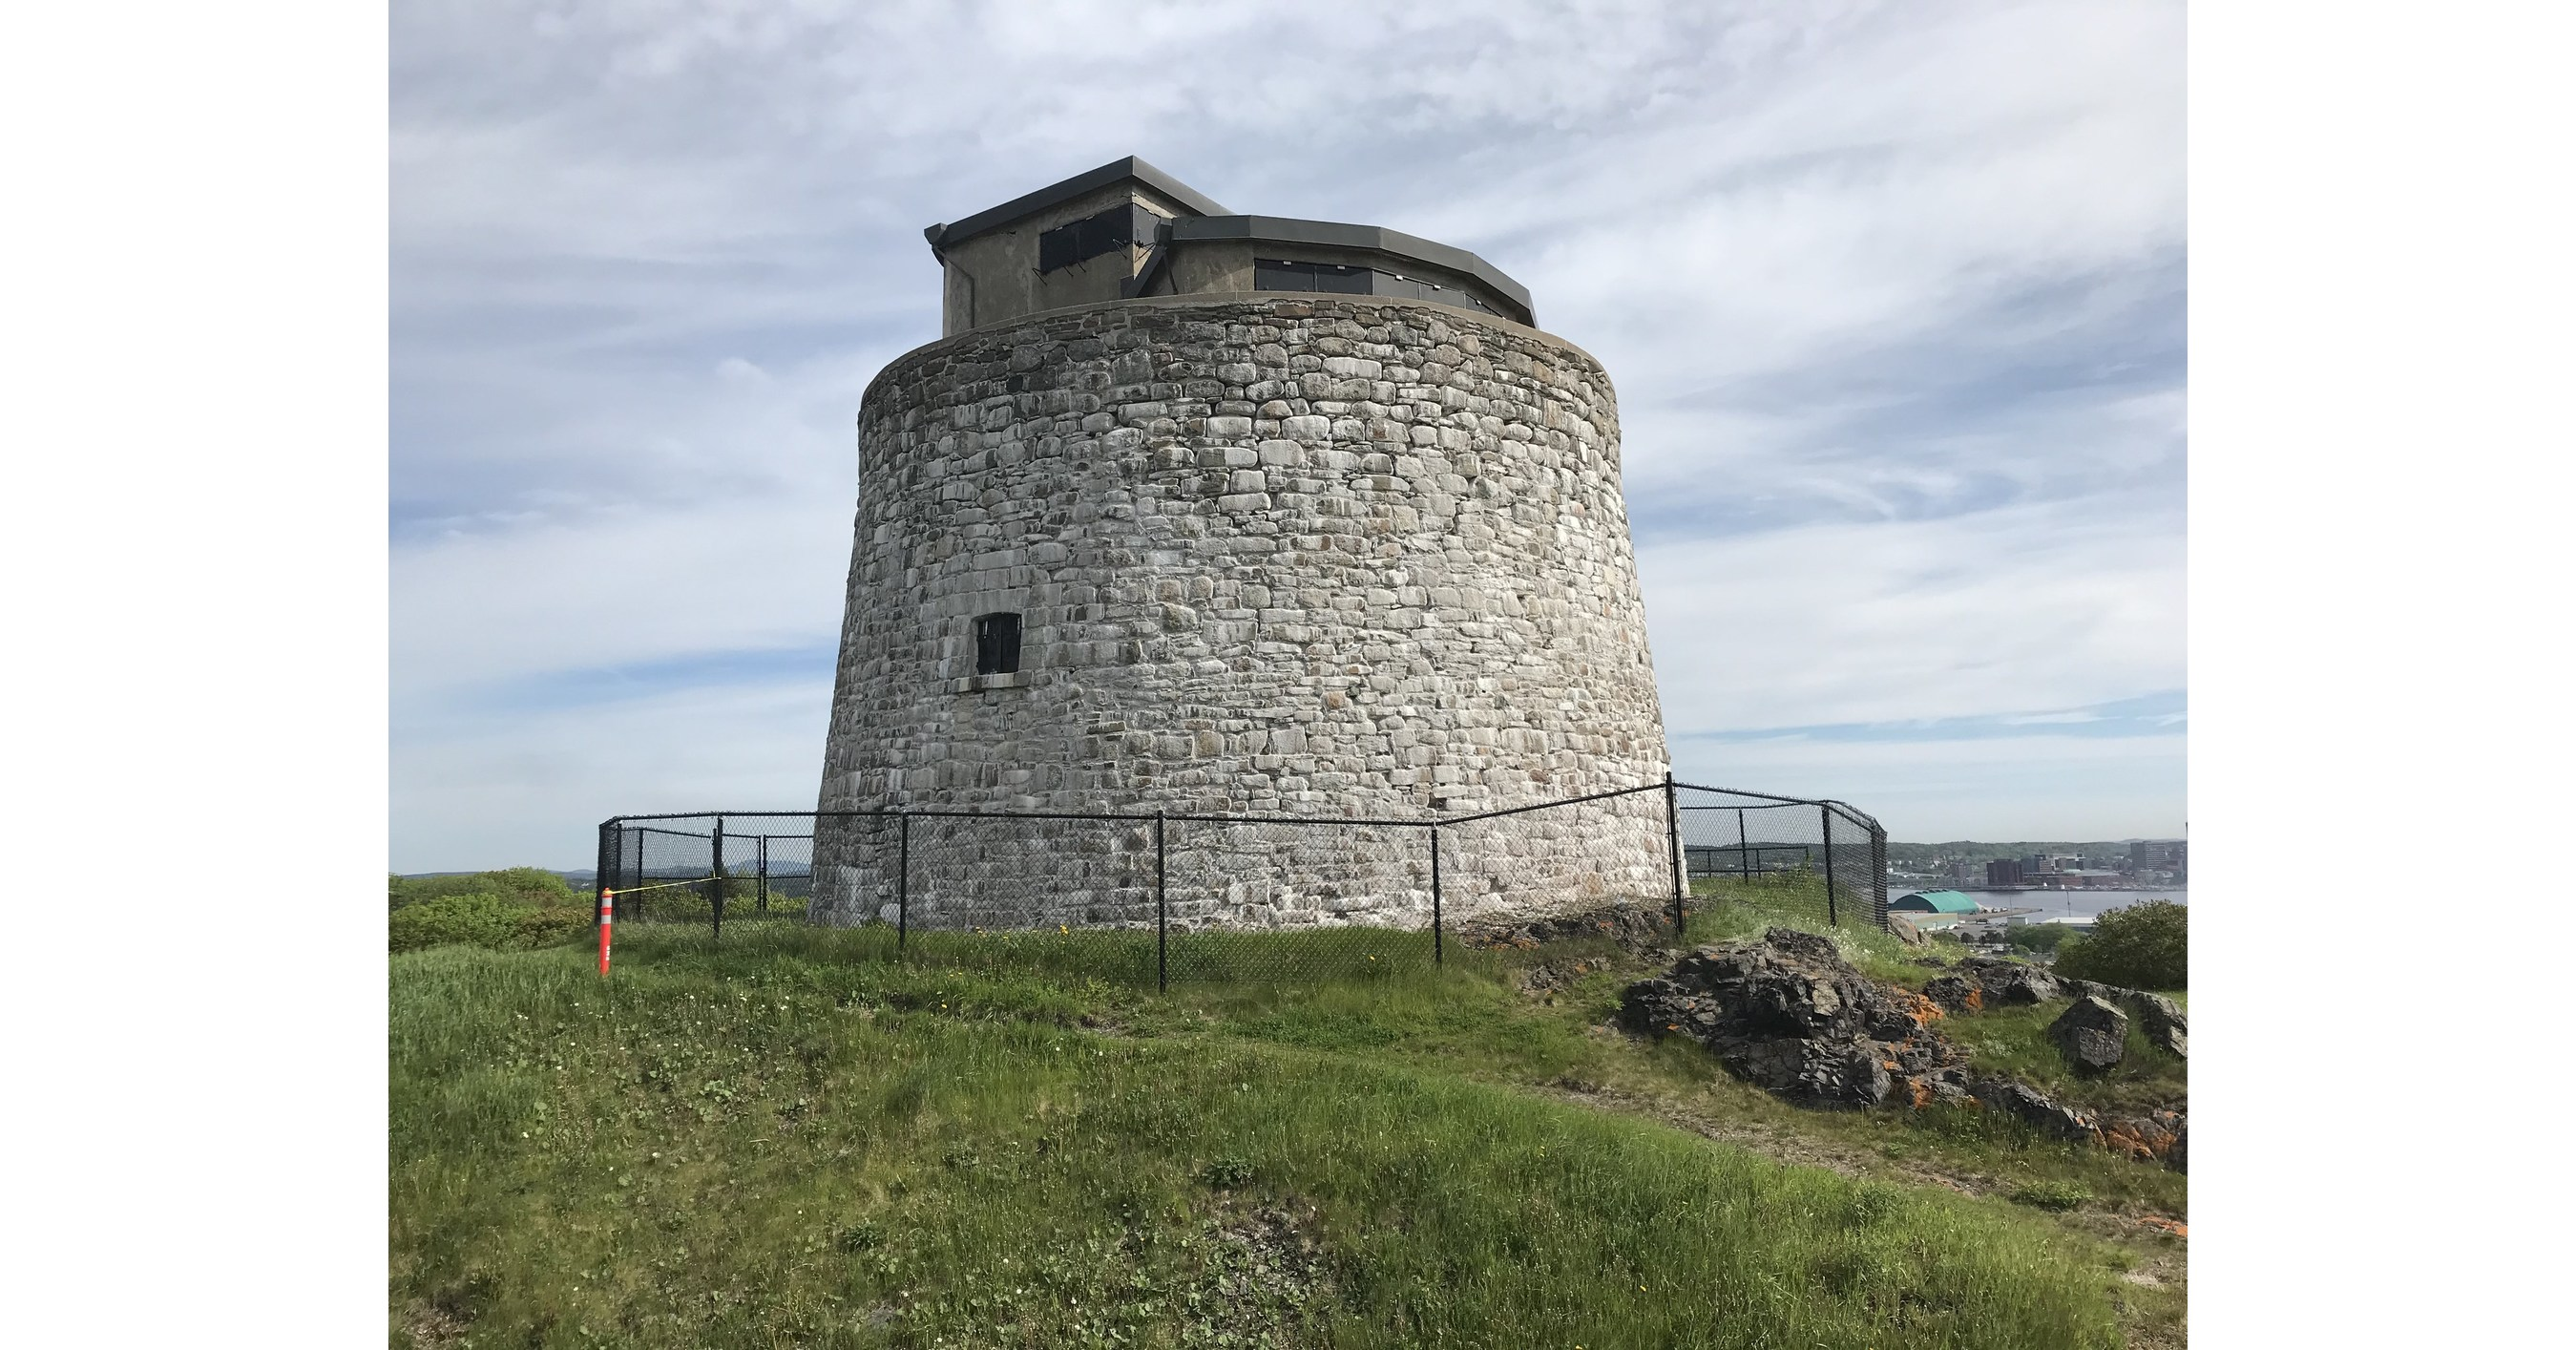 Carleton Martello Tower in Saint John New Brunswick to be restored by Groupe Atwill-Morin - Canada NewsWire